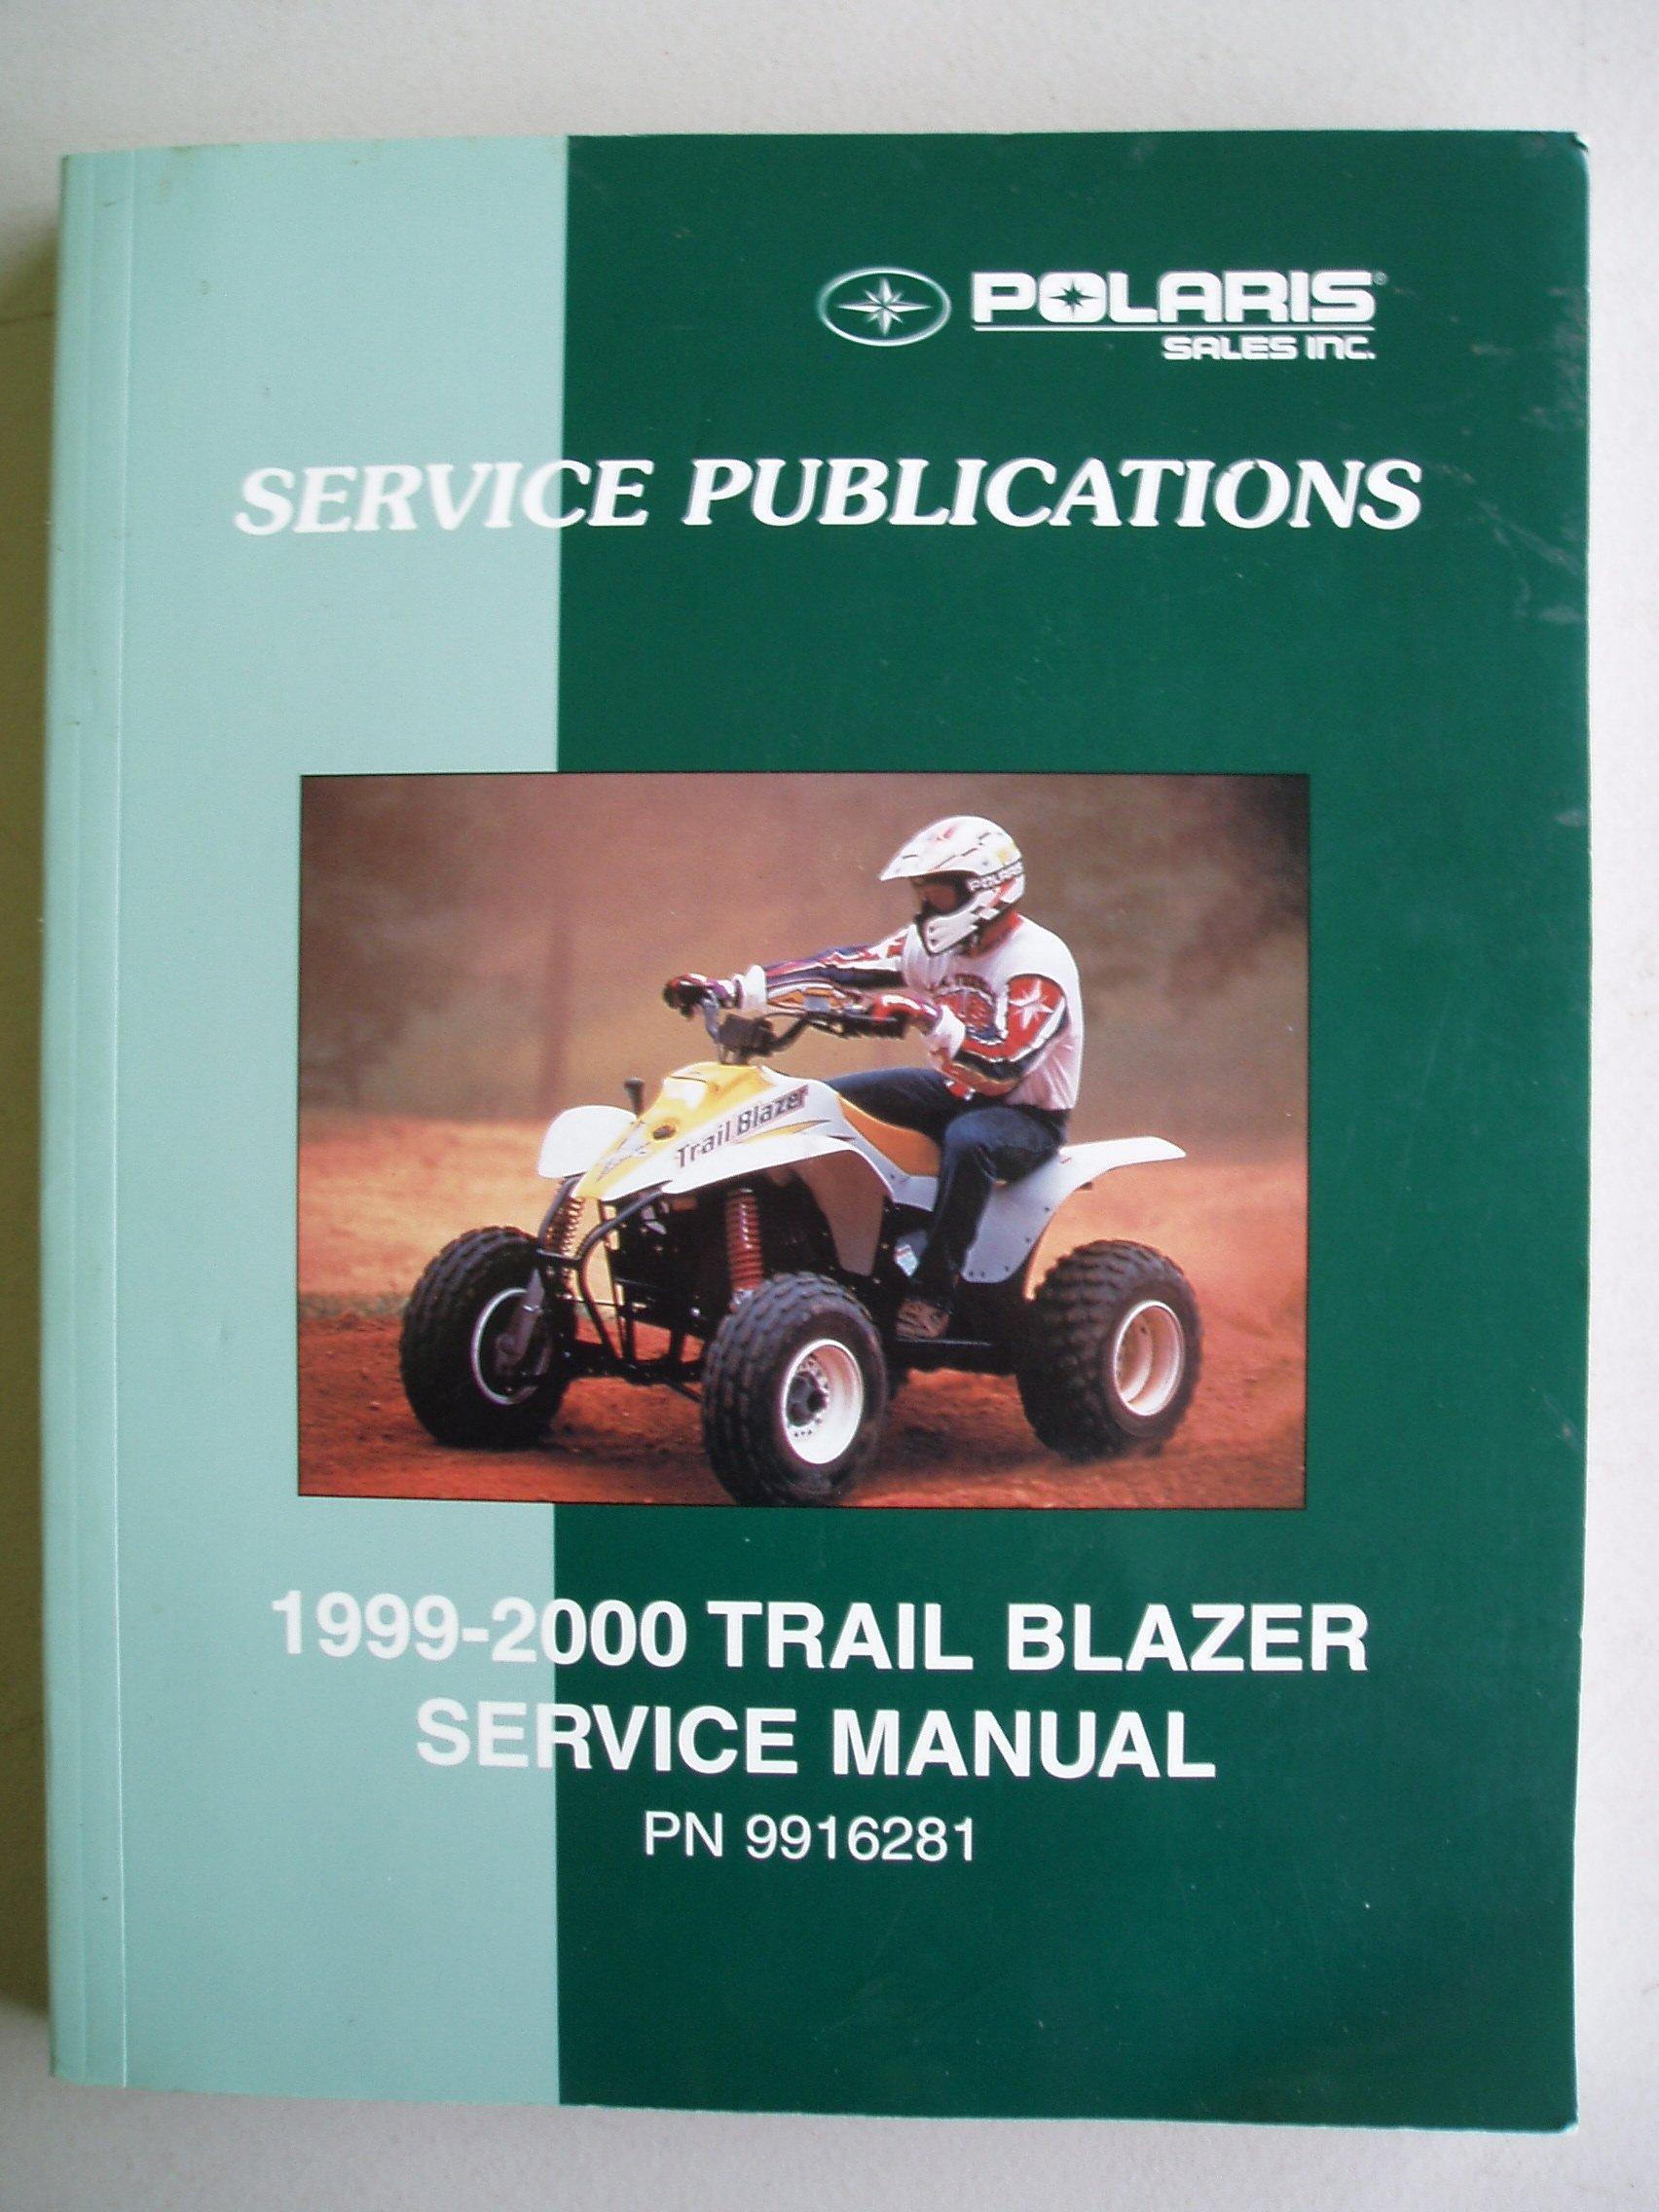 POLARIS 1999-2000 Trail Blazer ATV Service Manual (PN 9916281): Polaris  Personnel: Amazon.com: Books